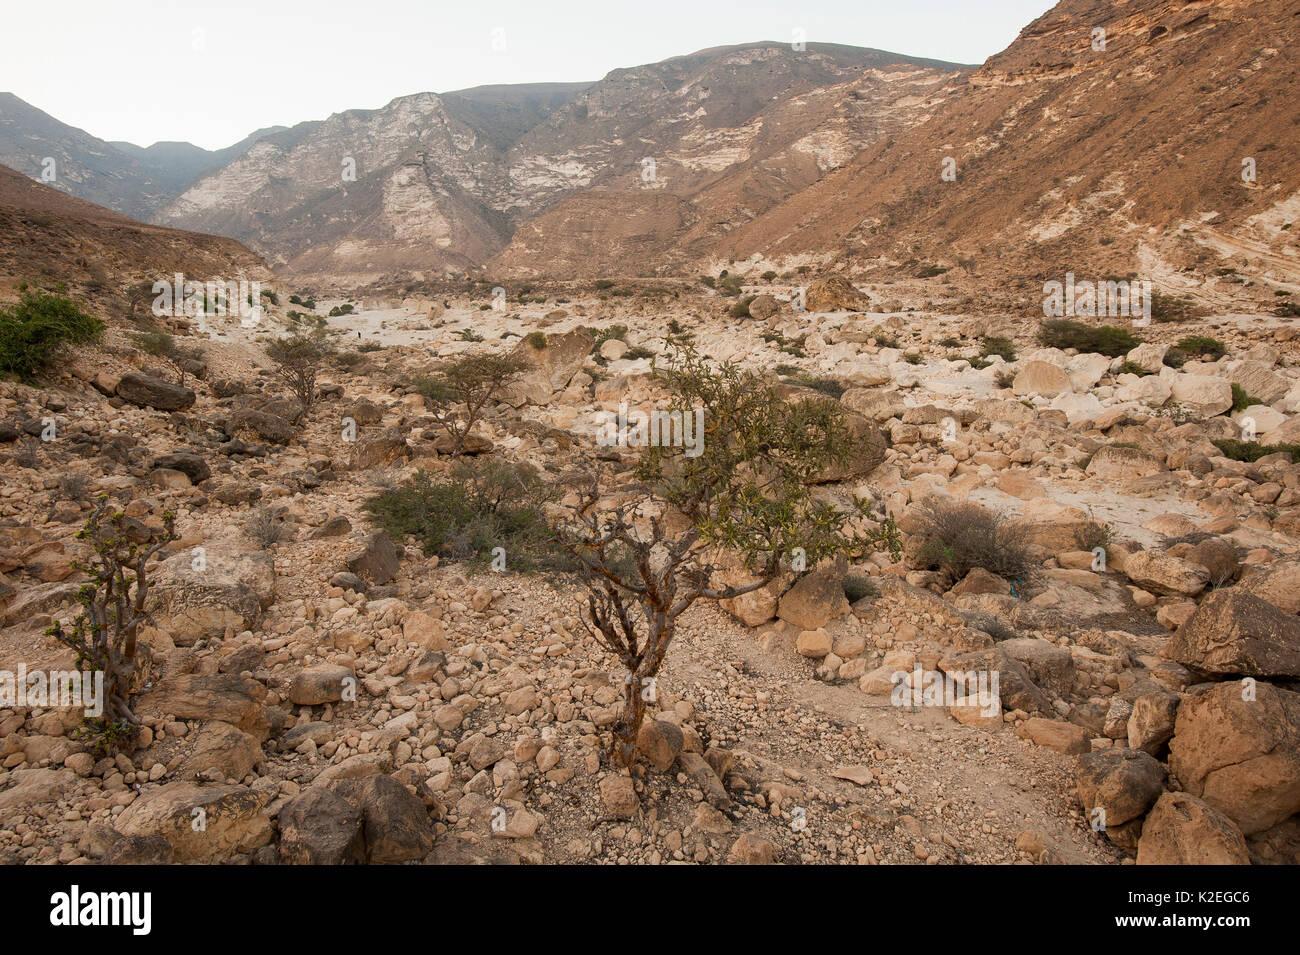 Rocky desert of Wadi Hashir near Al Mughsayl, Sultanate of Oman, February. - Stock Image